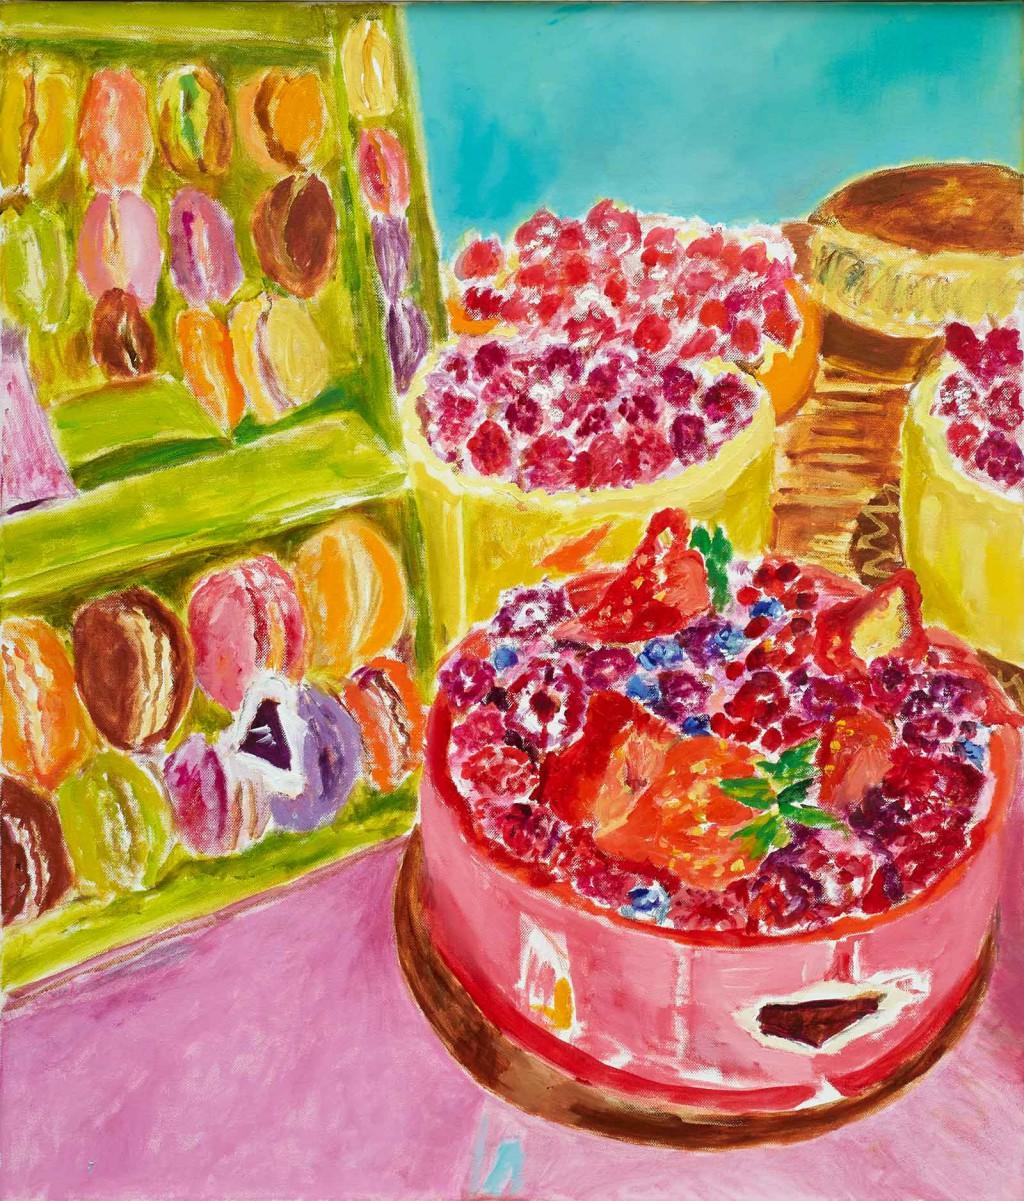 Macarons  2019  Oel auf Leinwand  70 x 60 cm/28 x 24 in